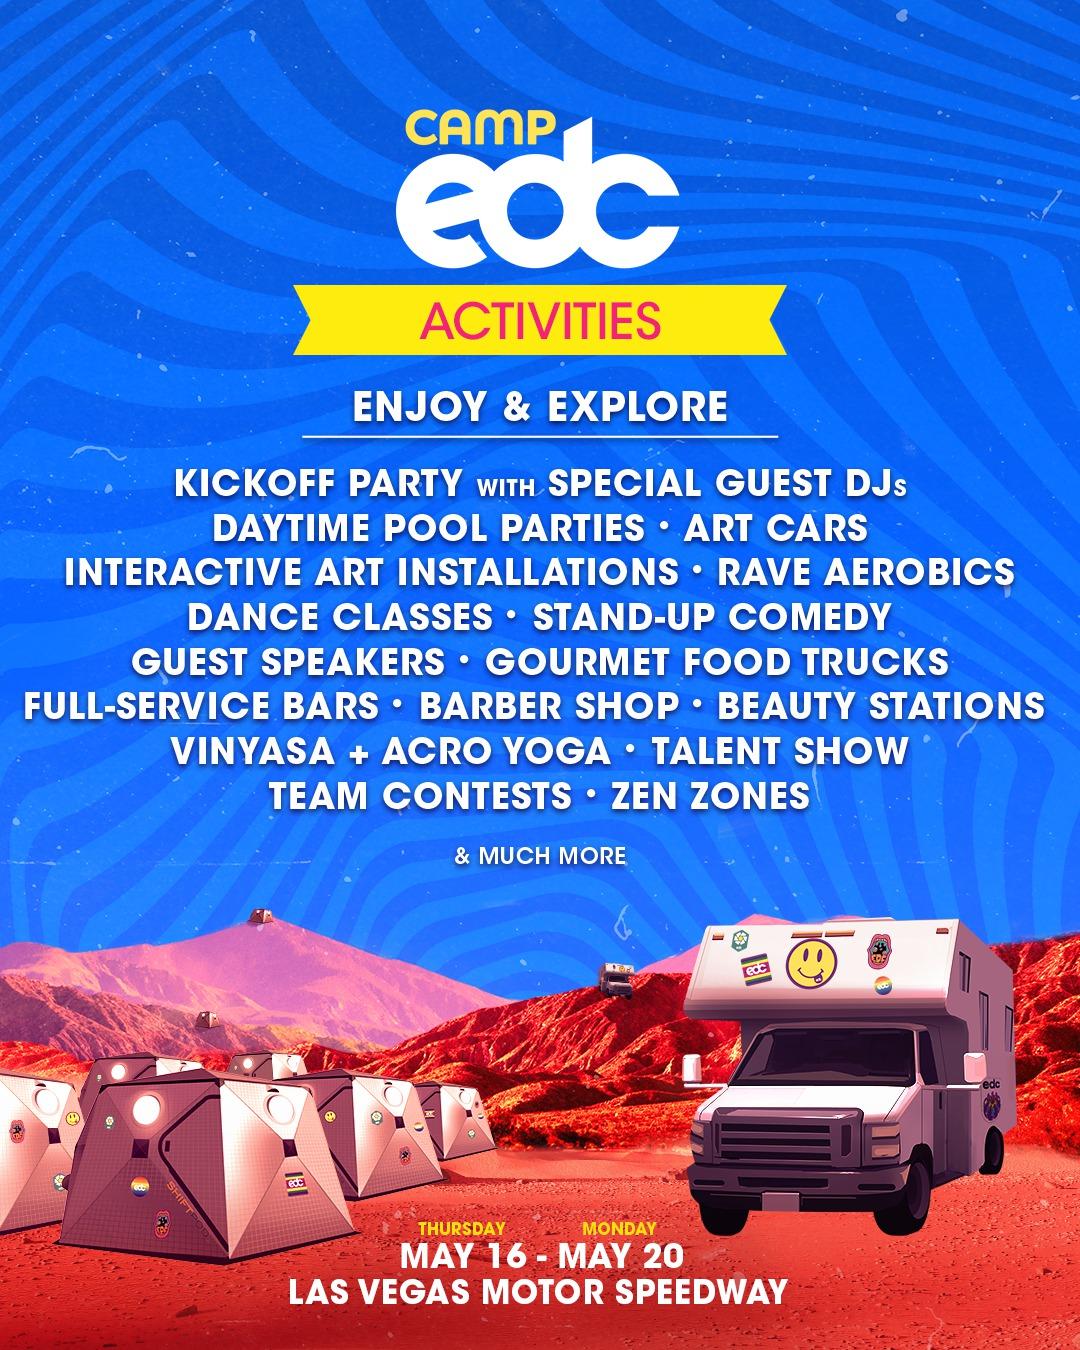 Camp EDC Activities EDC Las Vegas 2019 | EDM Identity